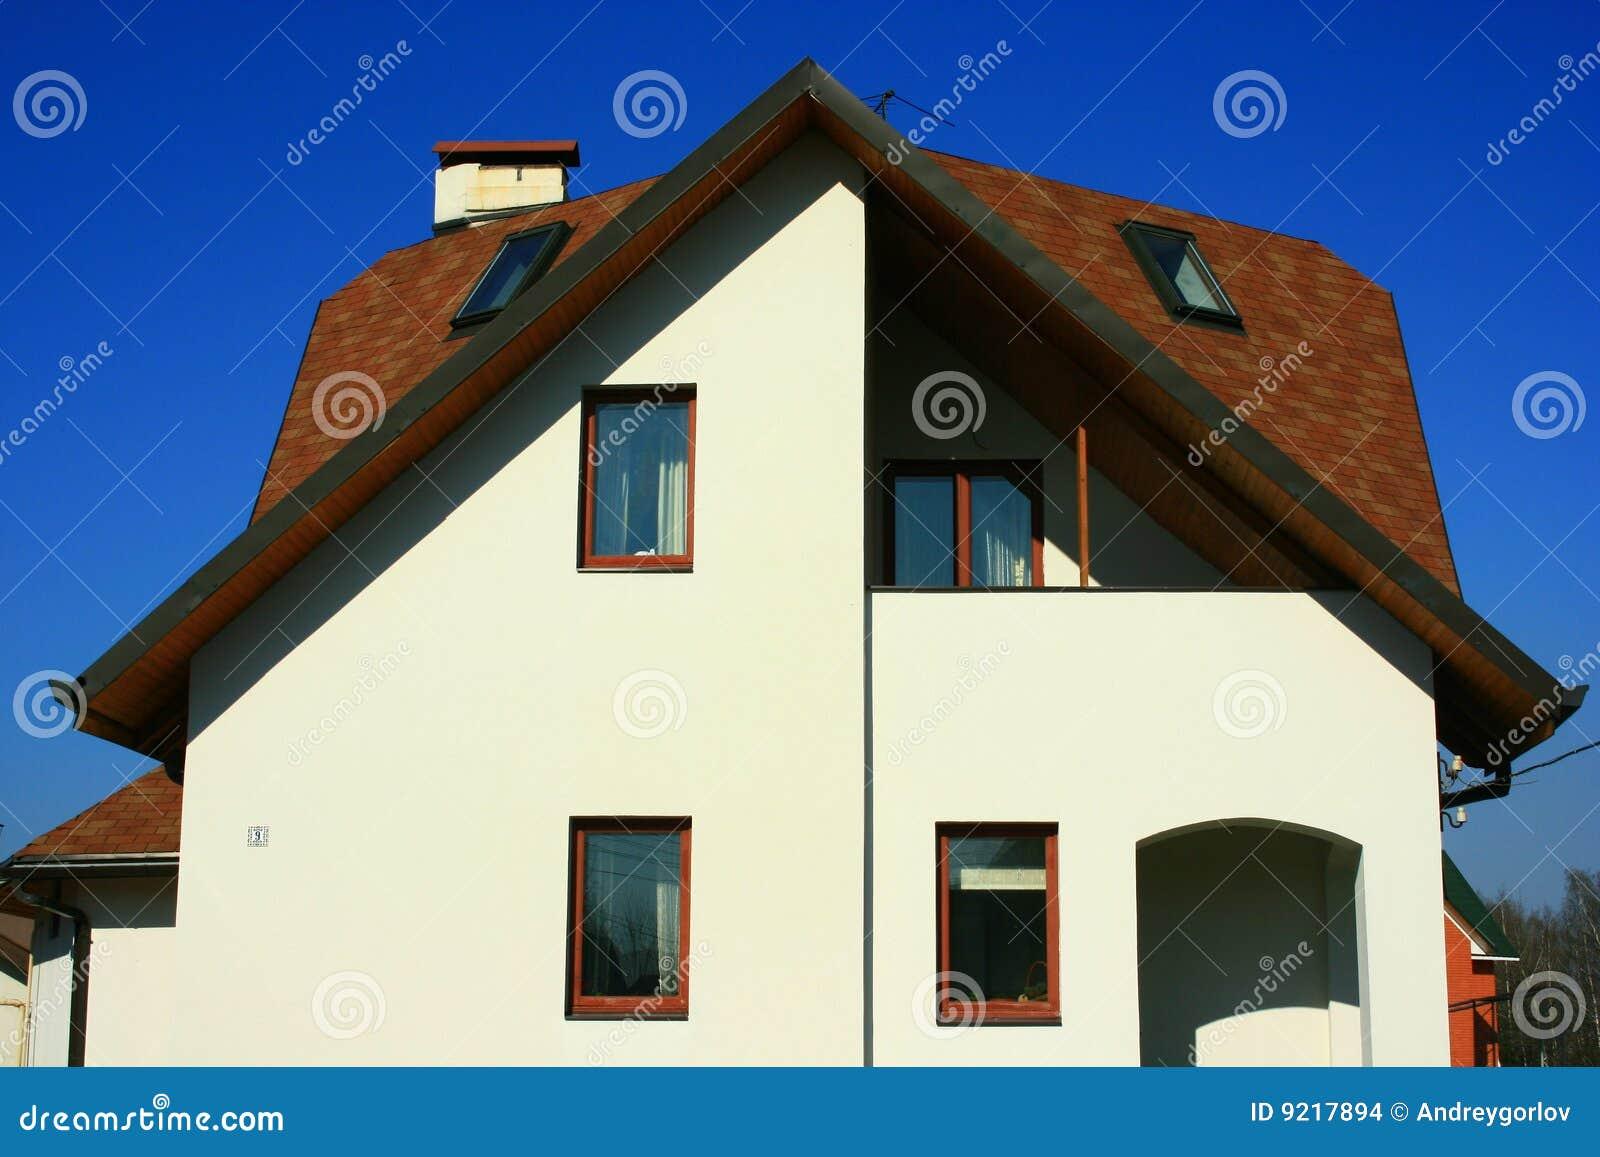 Fachada da casa de campo imagens de stock imagem 9217894 for Fachada casa campo